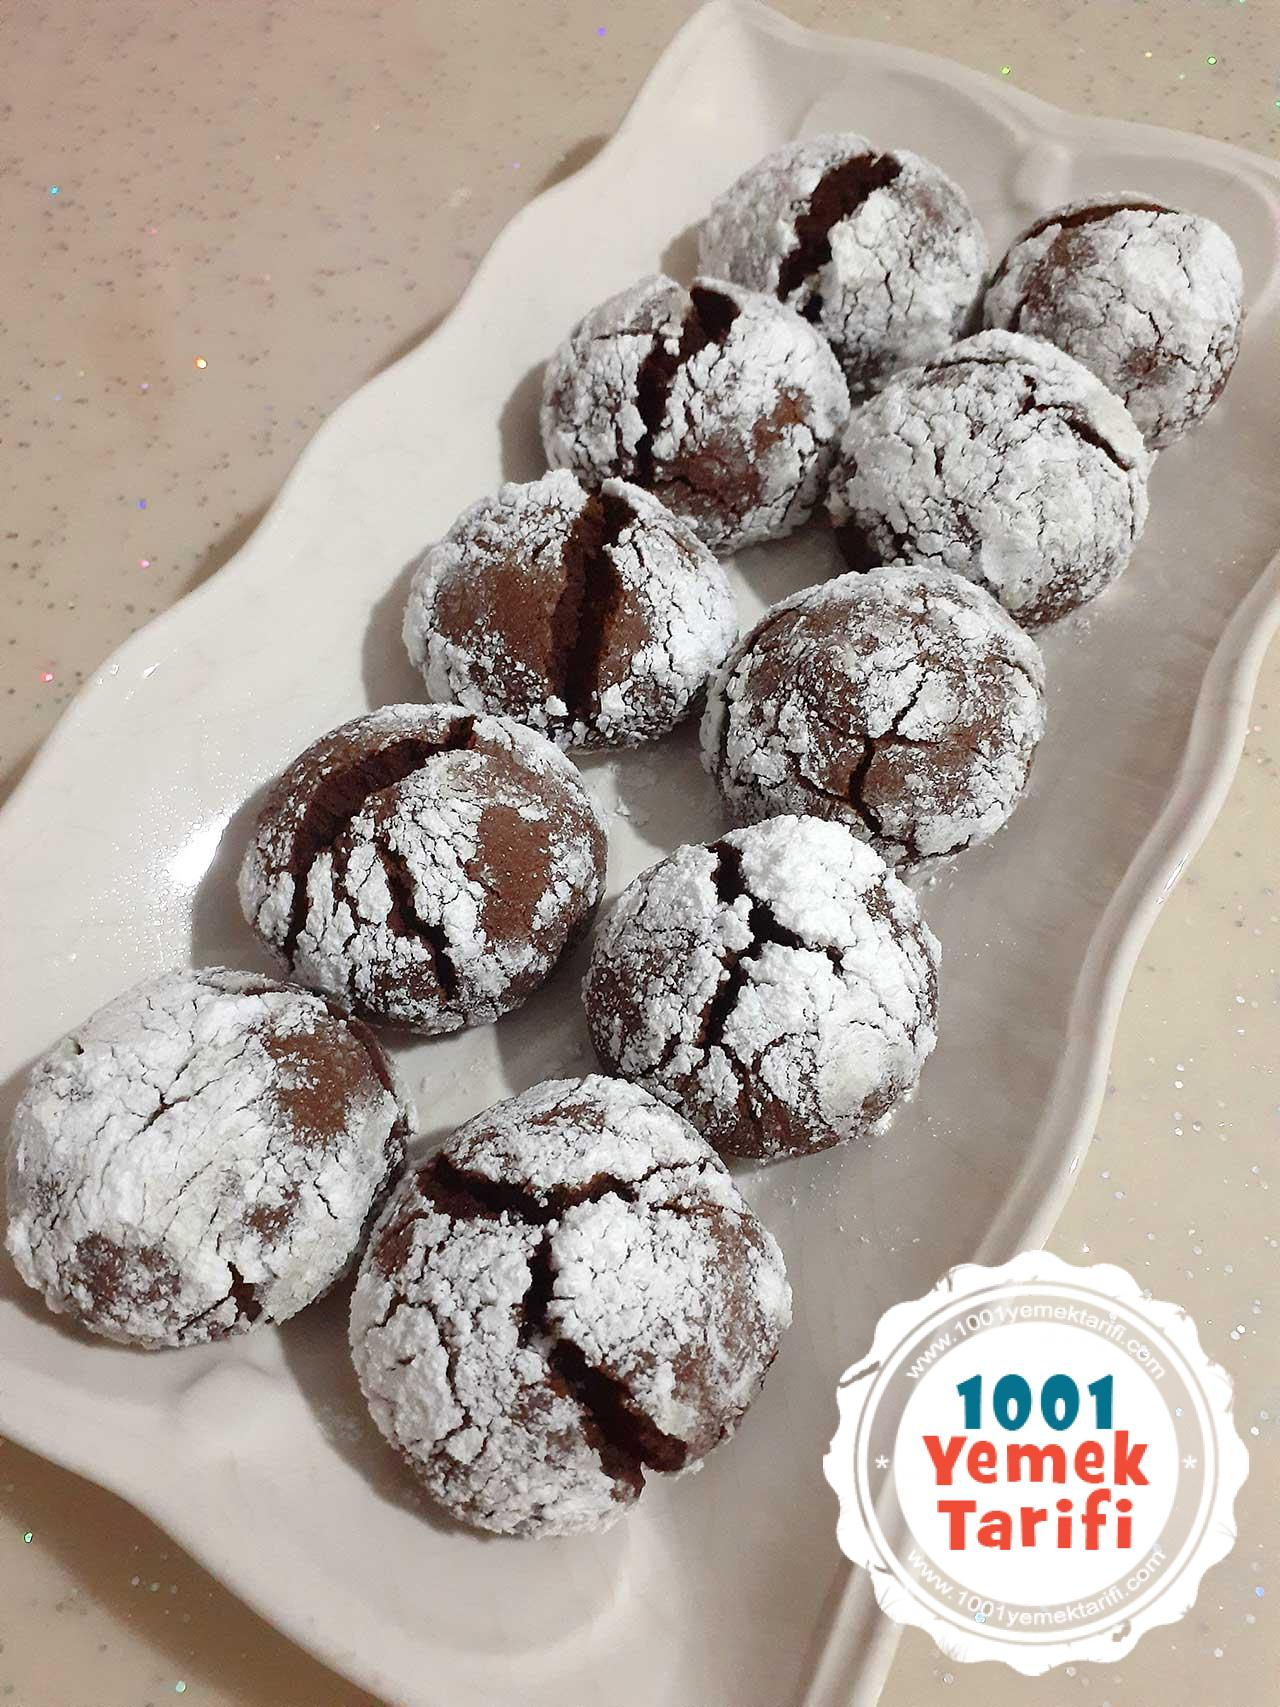 kakaolu truf kurabiye tarifi yapimi nasil yapilir-kac kalori-nefis-kolay